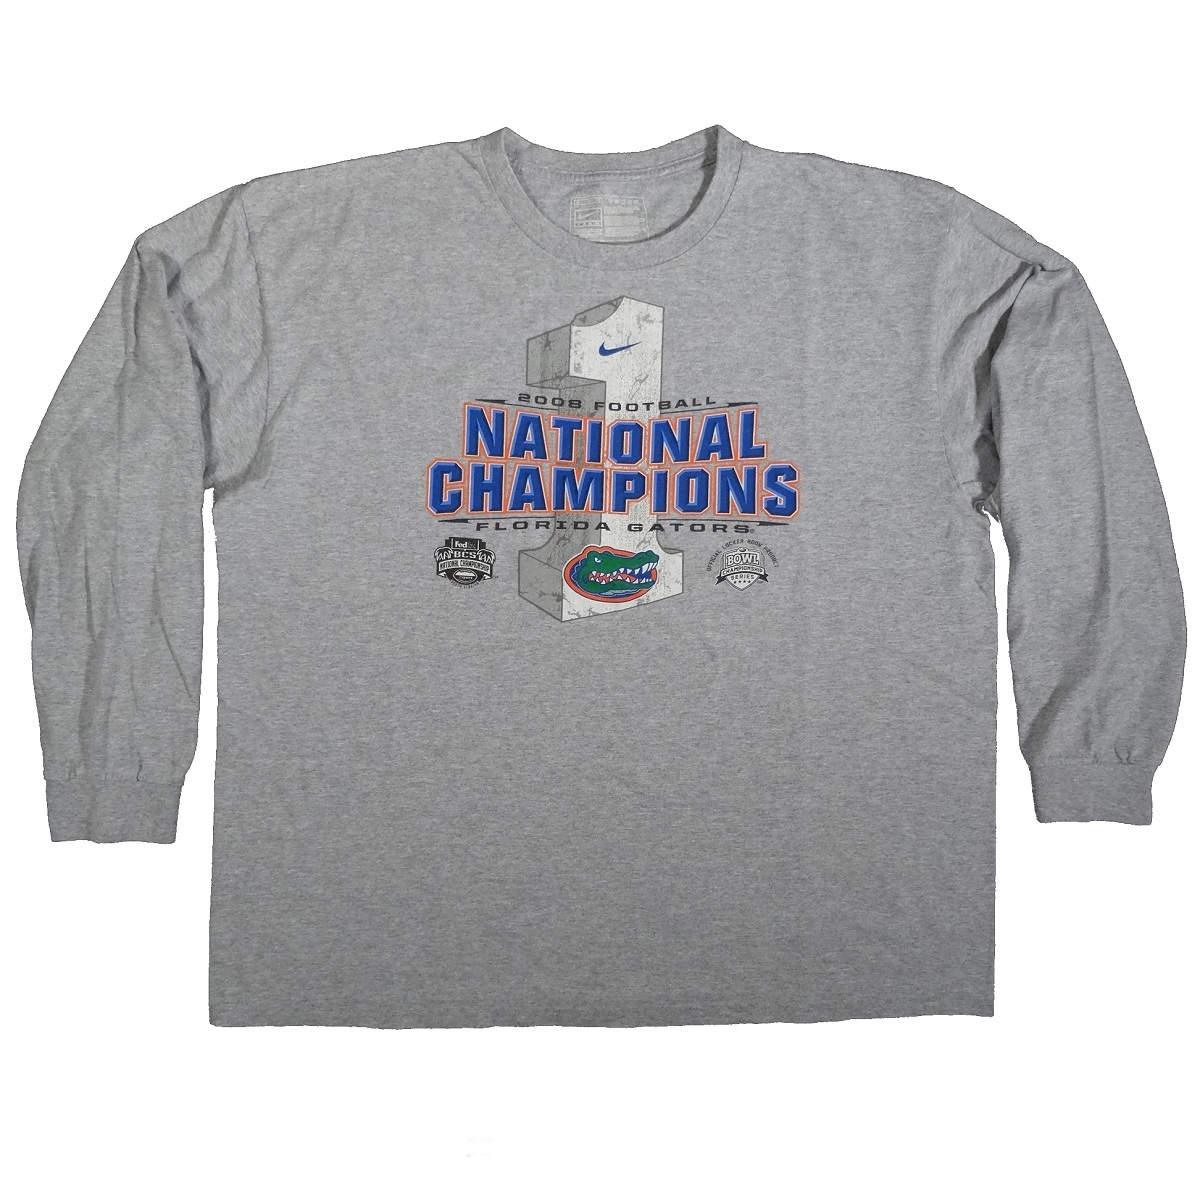 florida gators 2008 football national champions long sleeve nike t shirt front